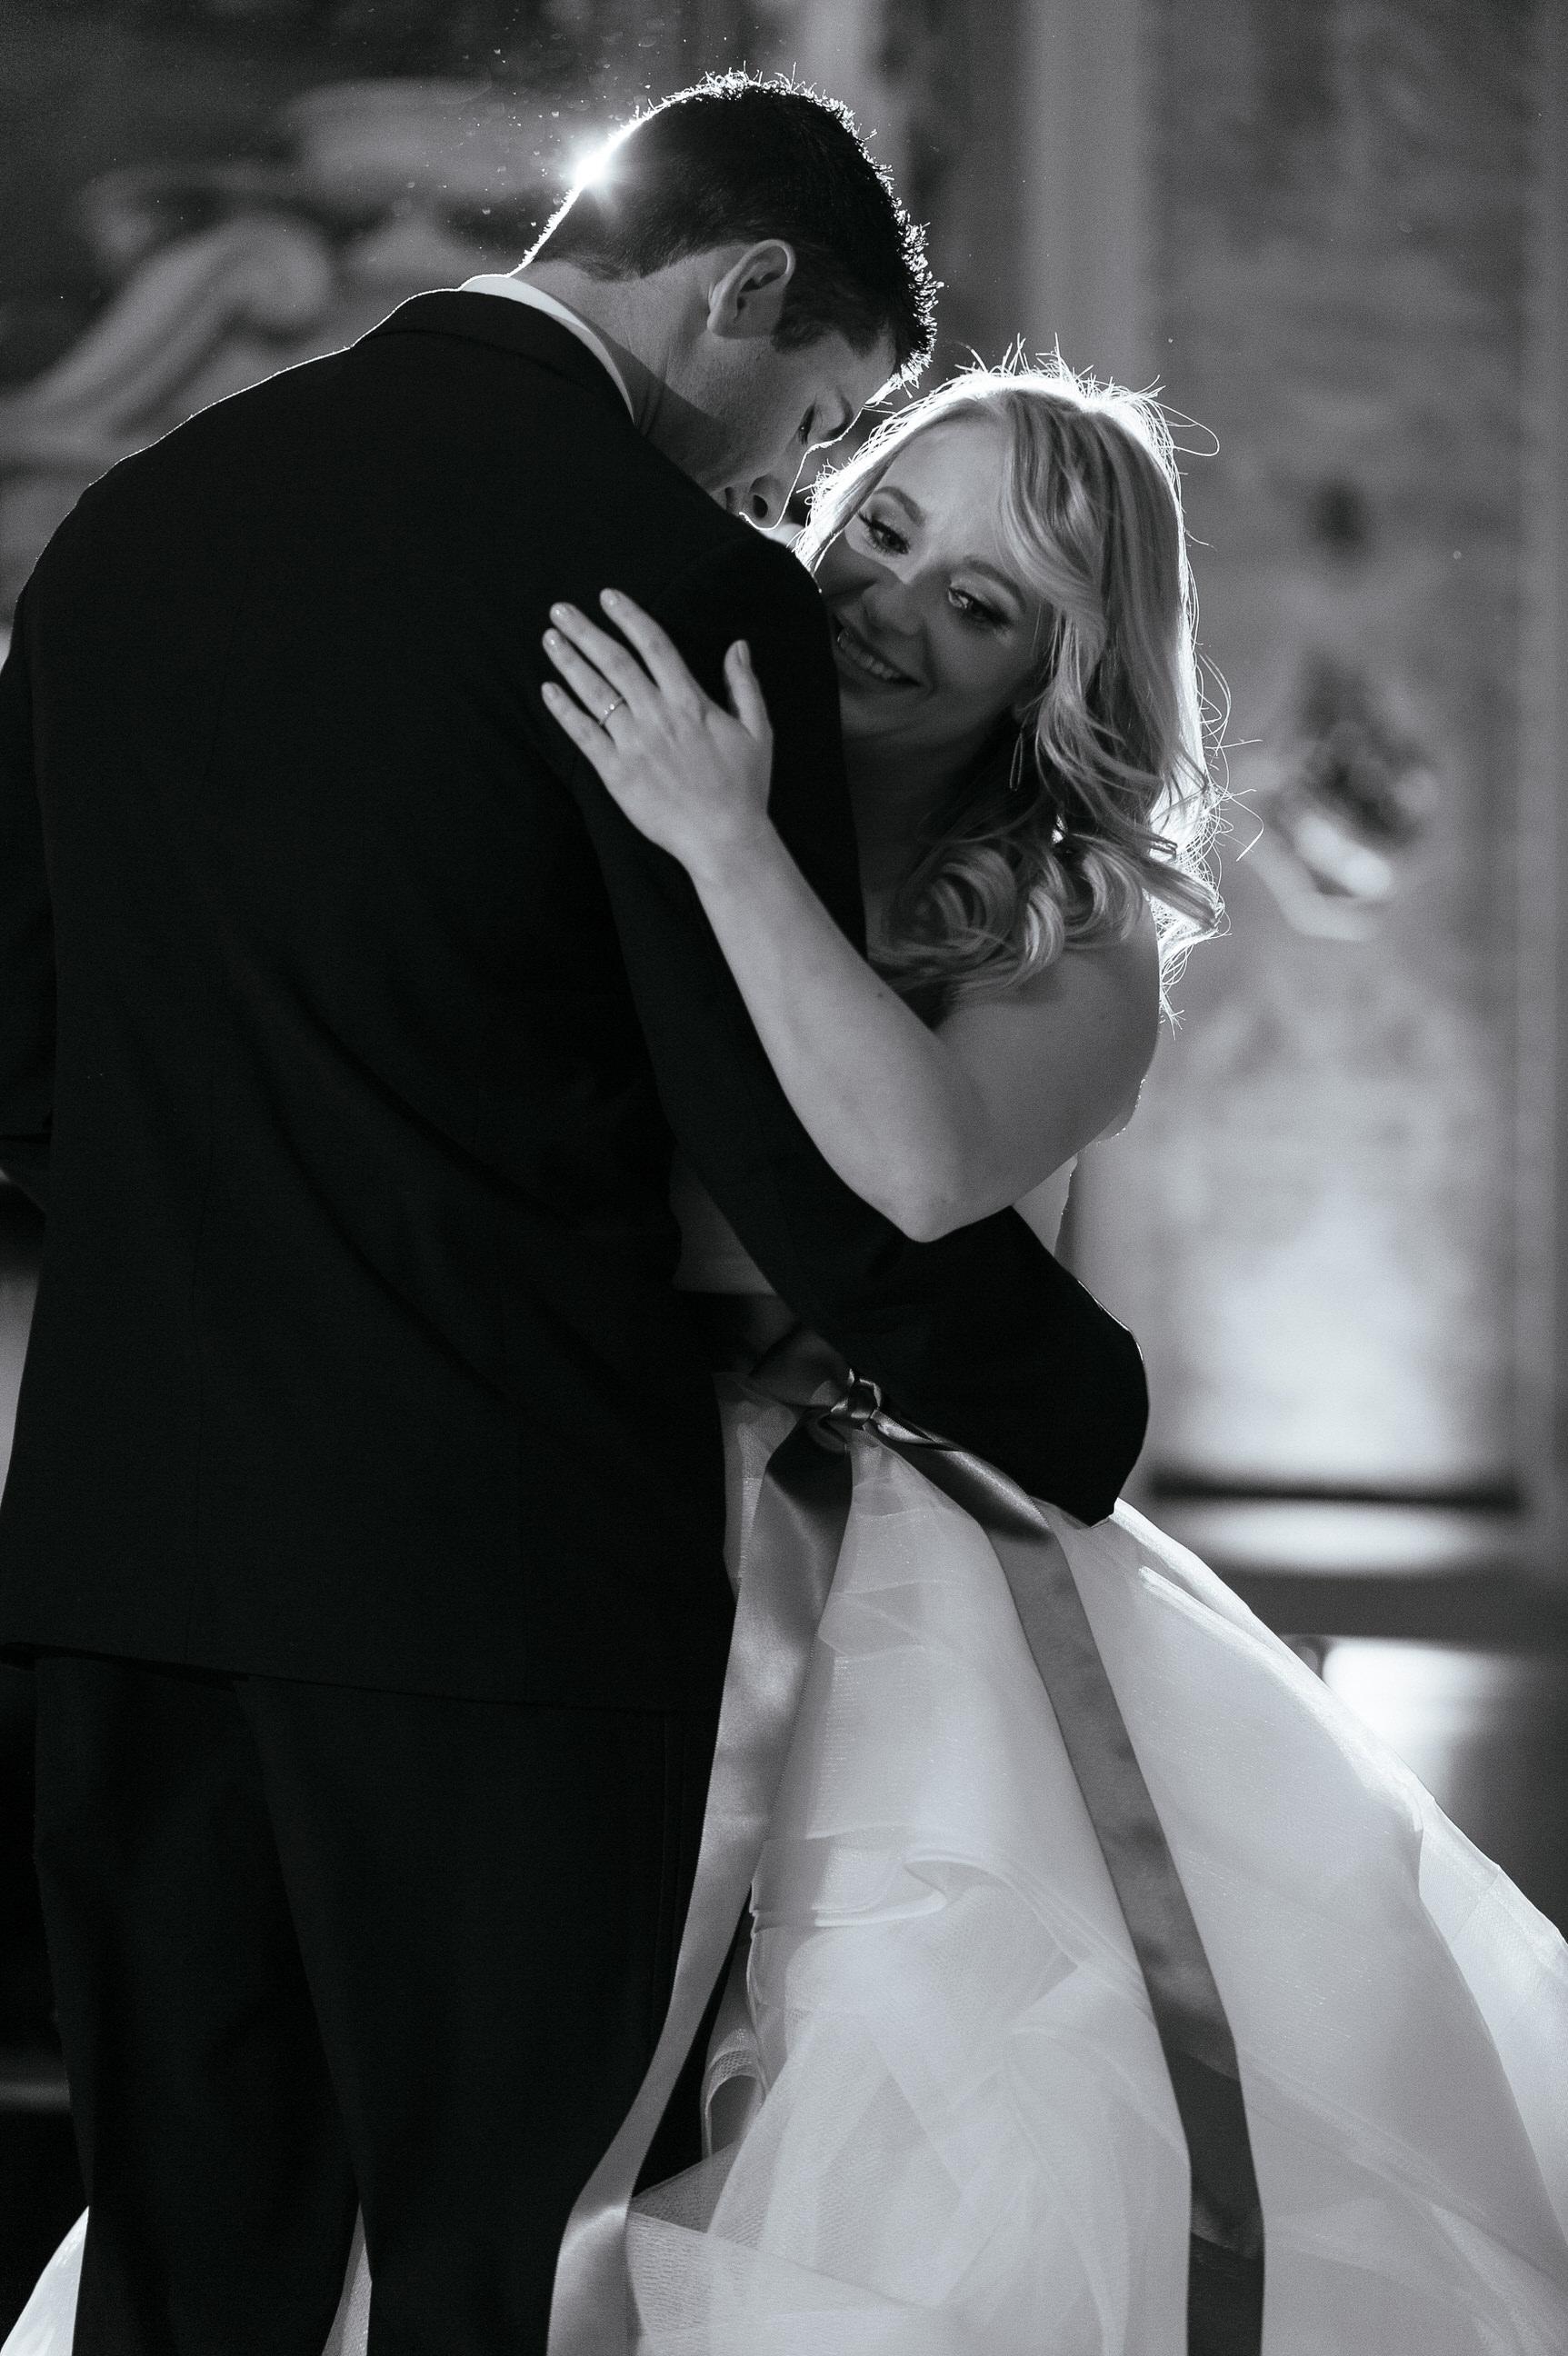 29 Hotel DuPont Wedding First Dance Wilmington Wedding Planner.jpg